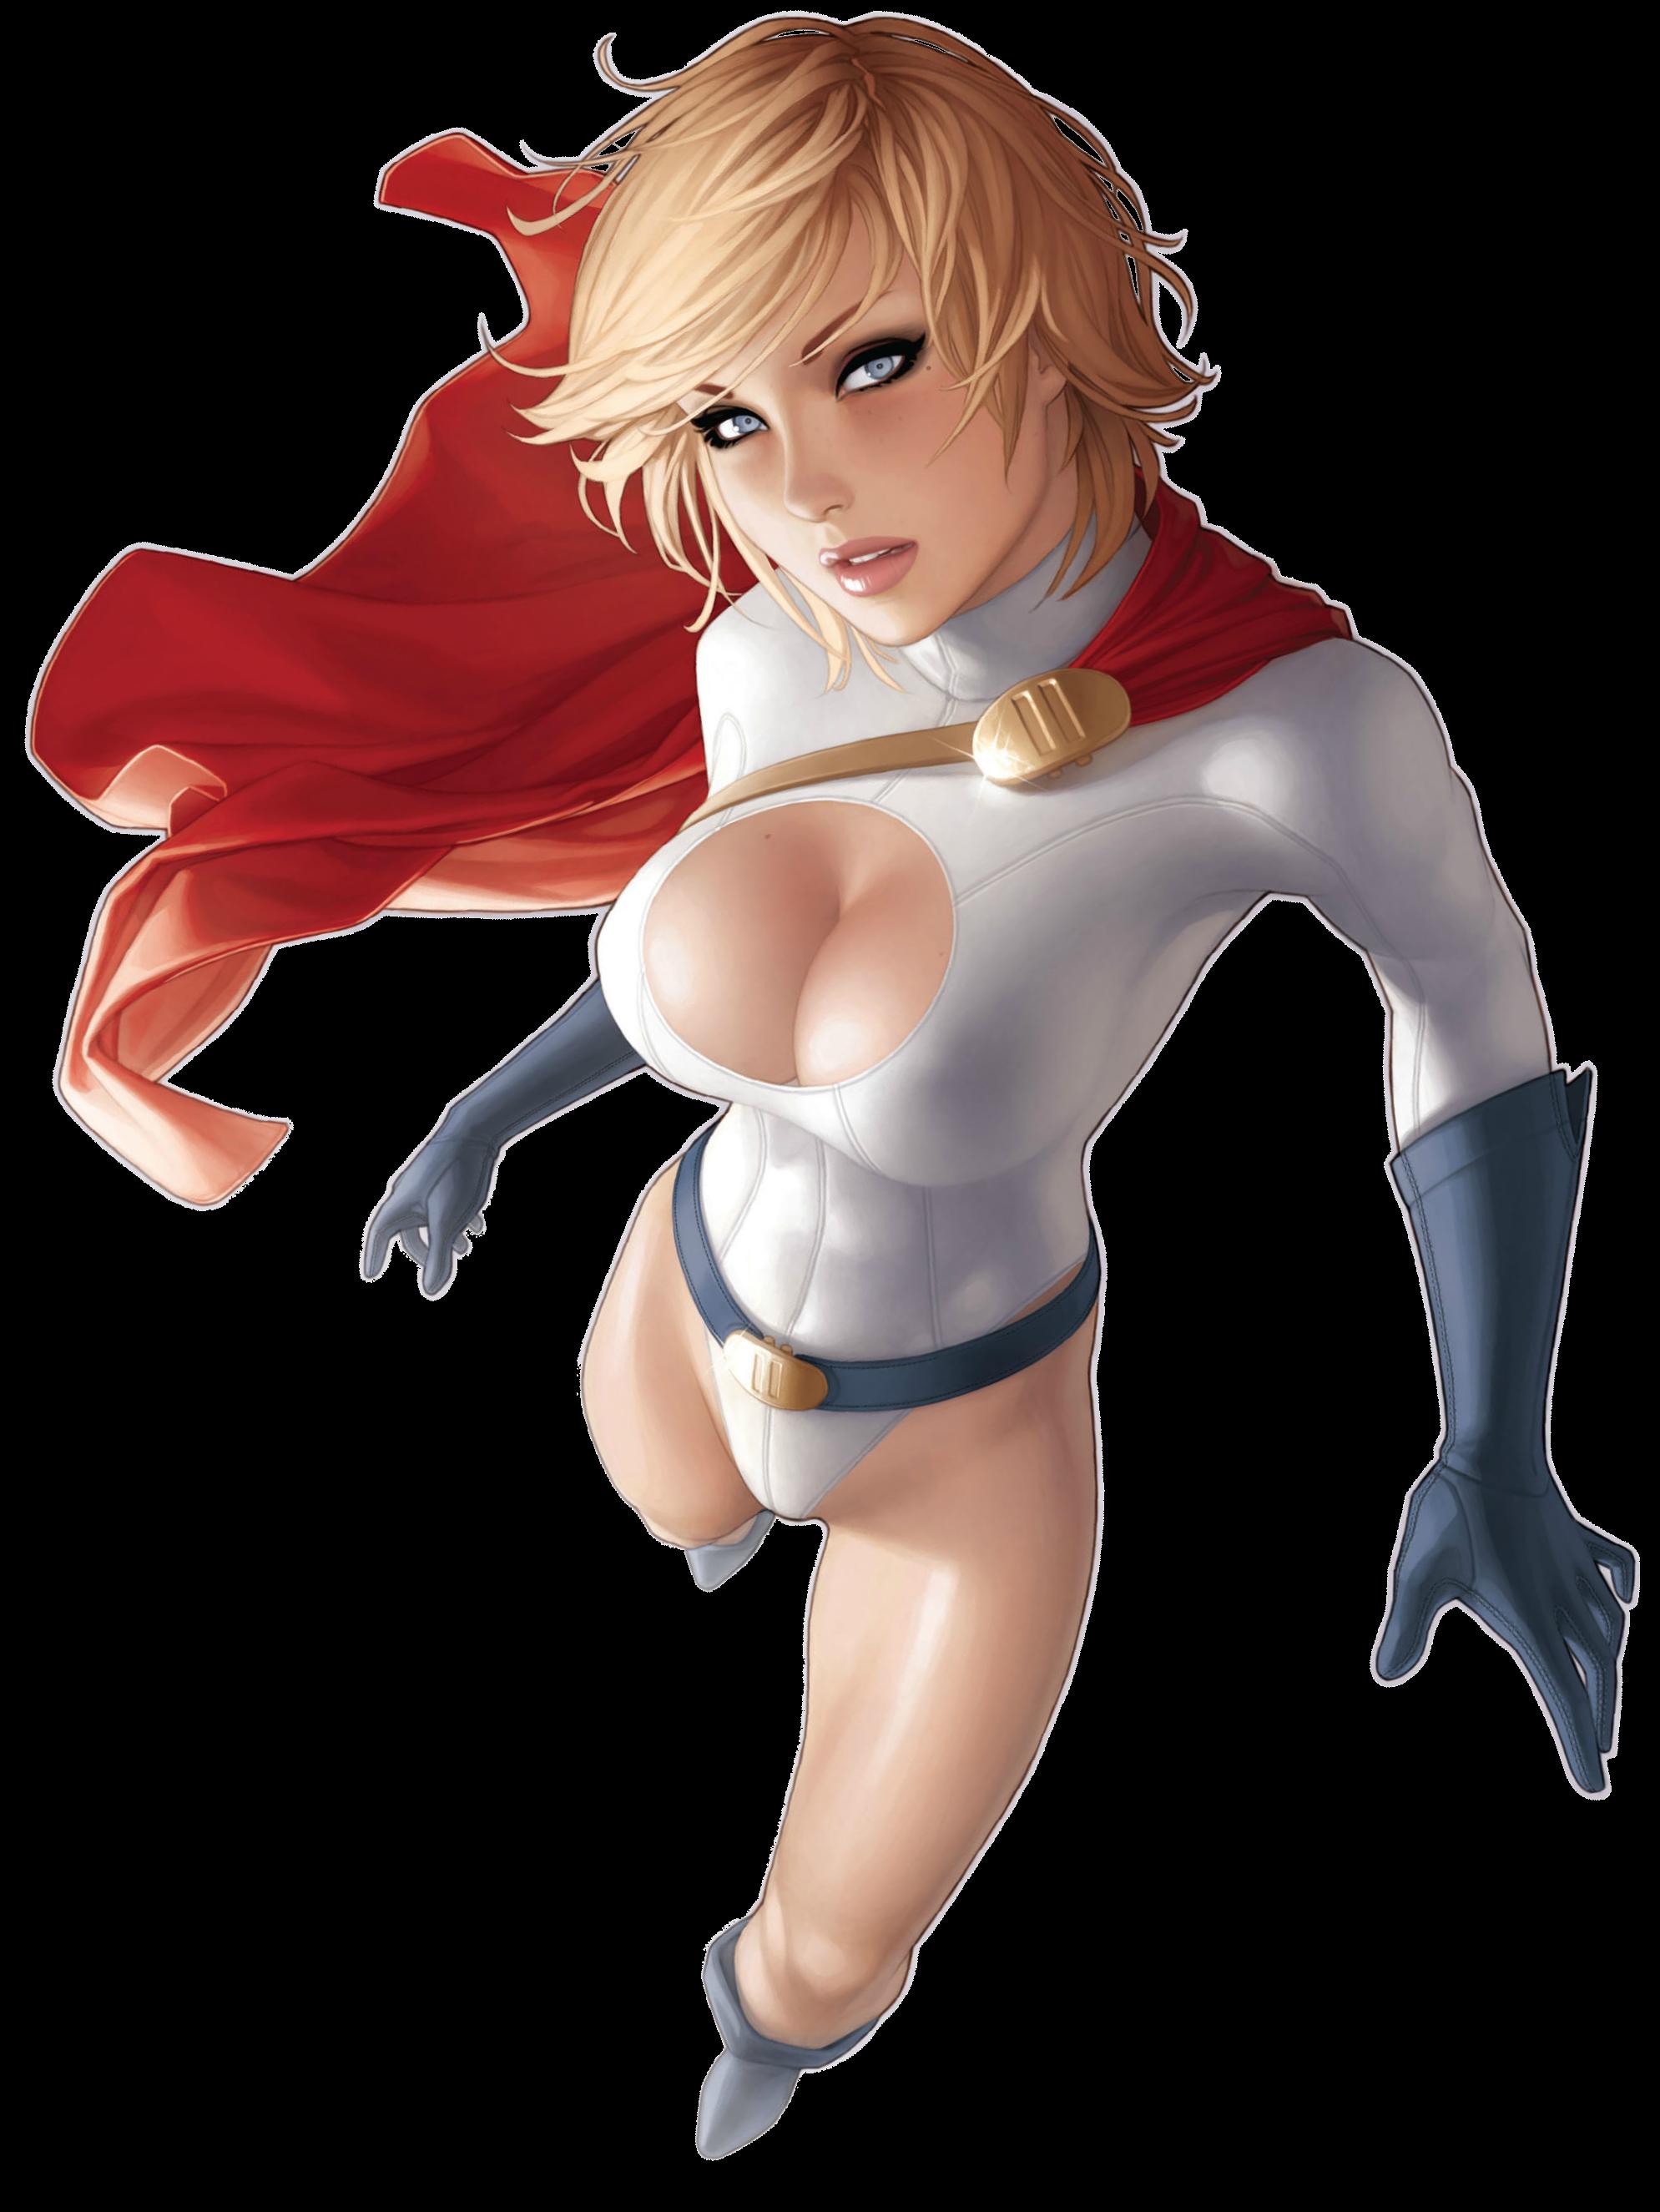 Resultado de imagen para Power Girl